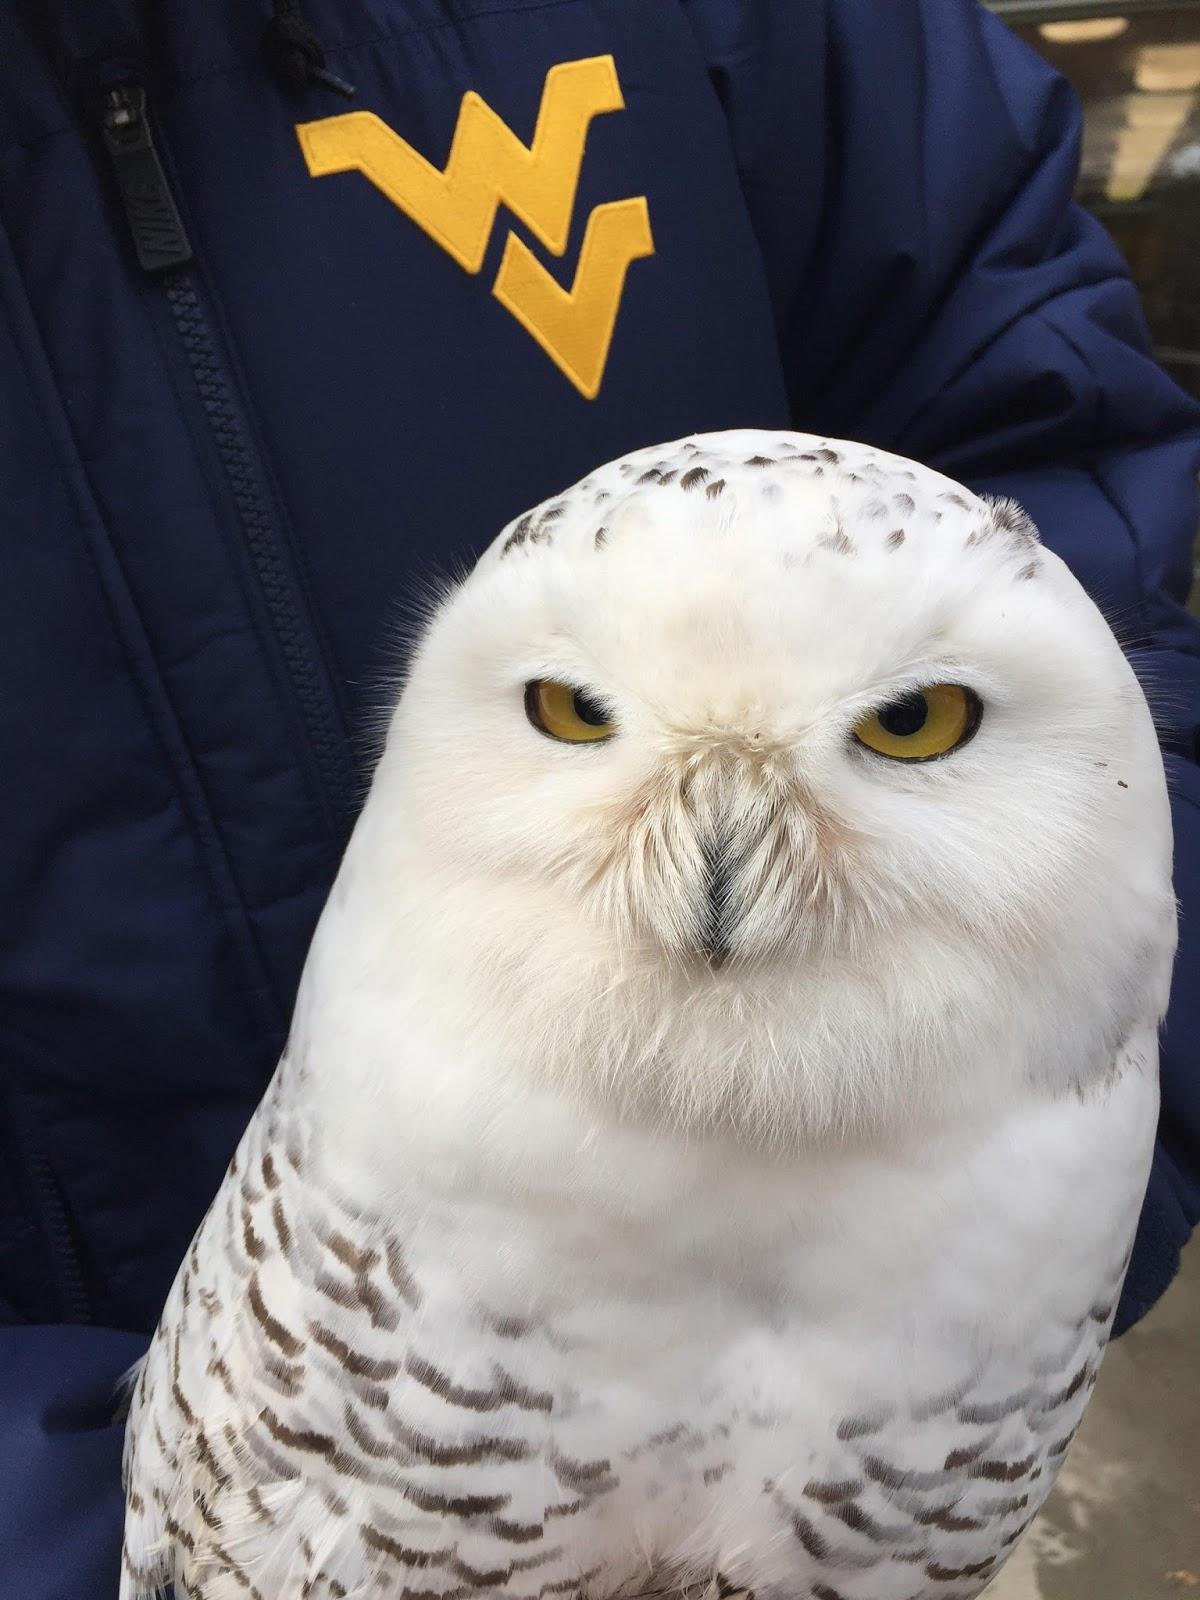 Julie Zickefoose On Blogspot - Meet the cuddly owl who loves landing on people